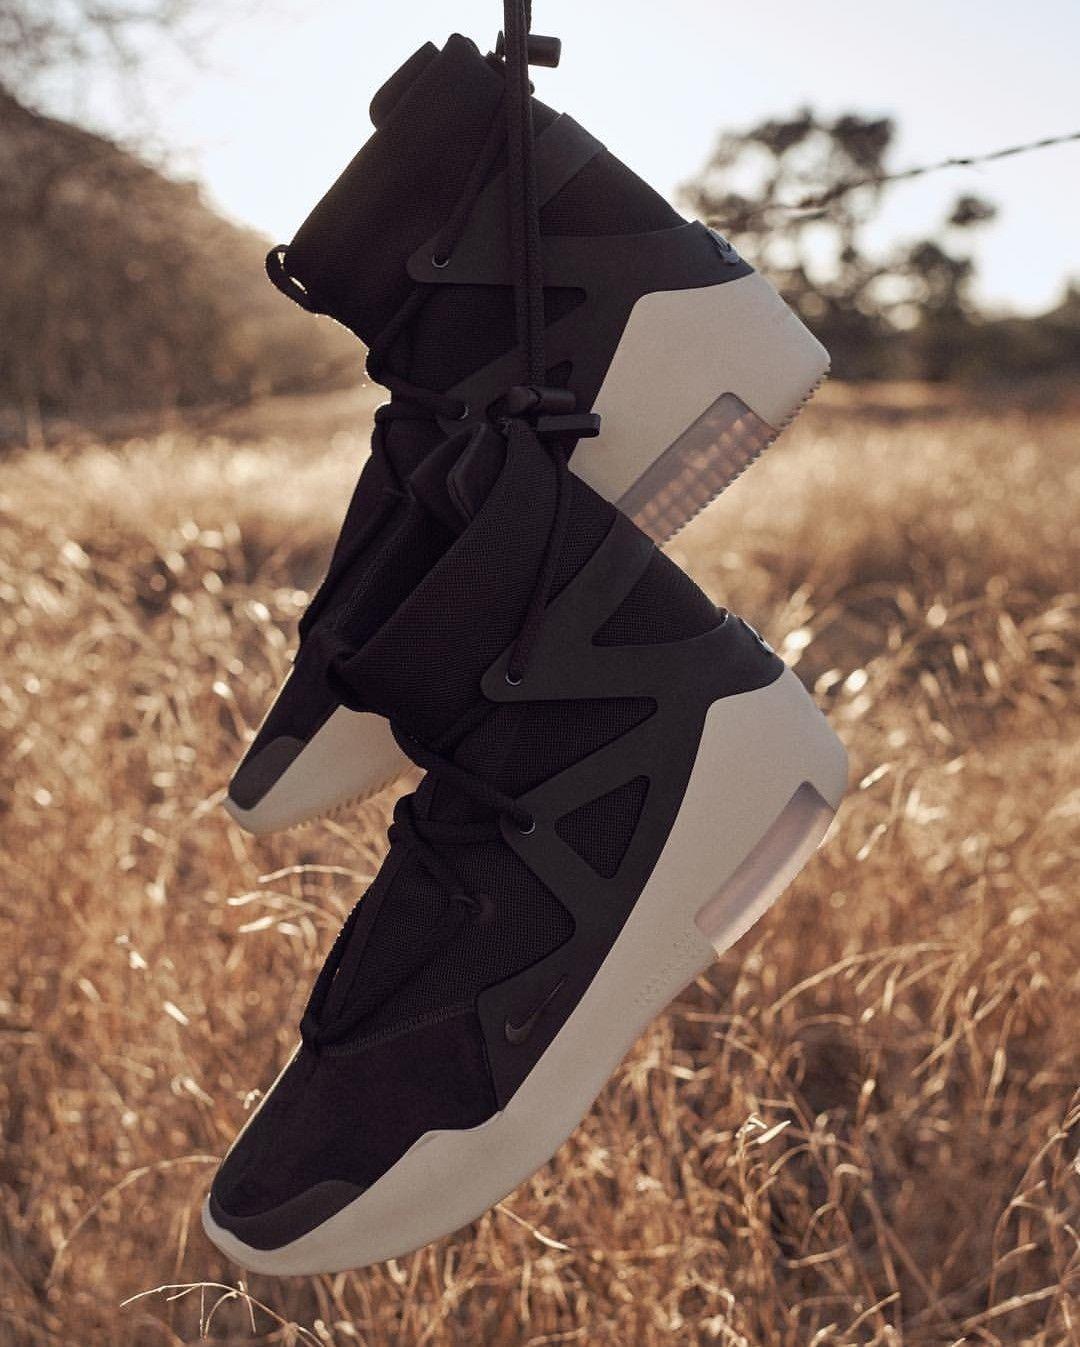 469a66d5f6704 Nike Air Fear of God 1 | Sneakers in 2019 | Sneakers nike, Sneakers ...